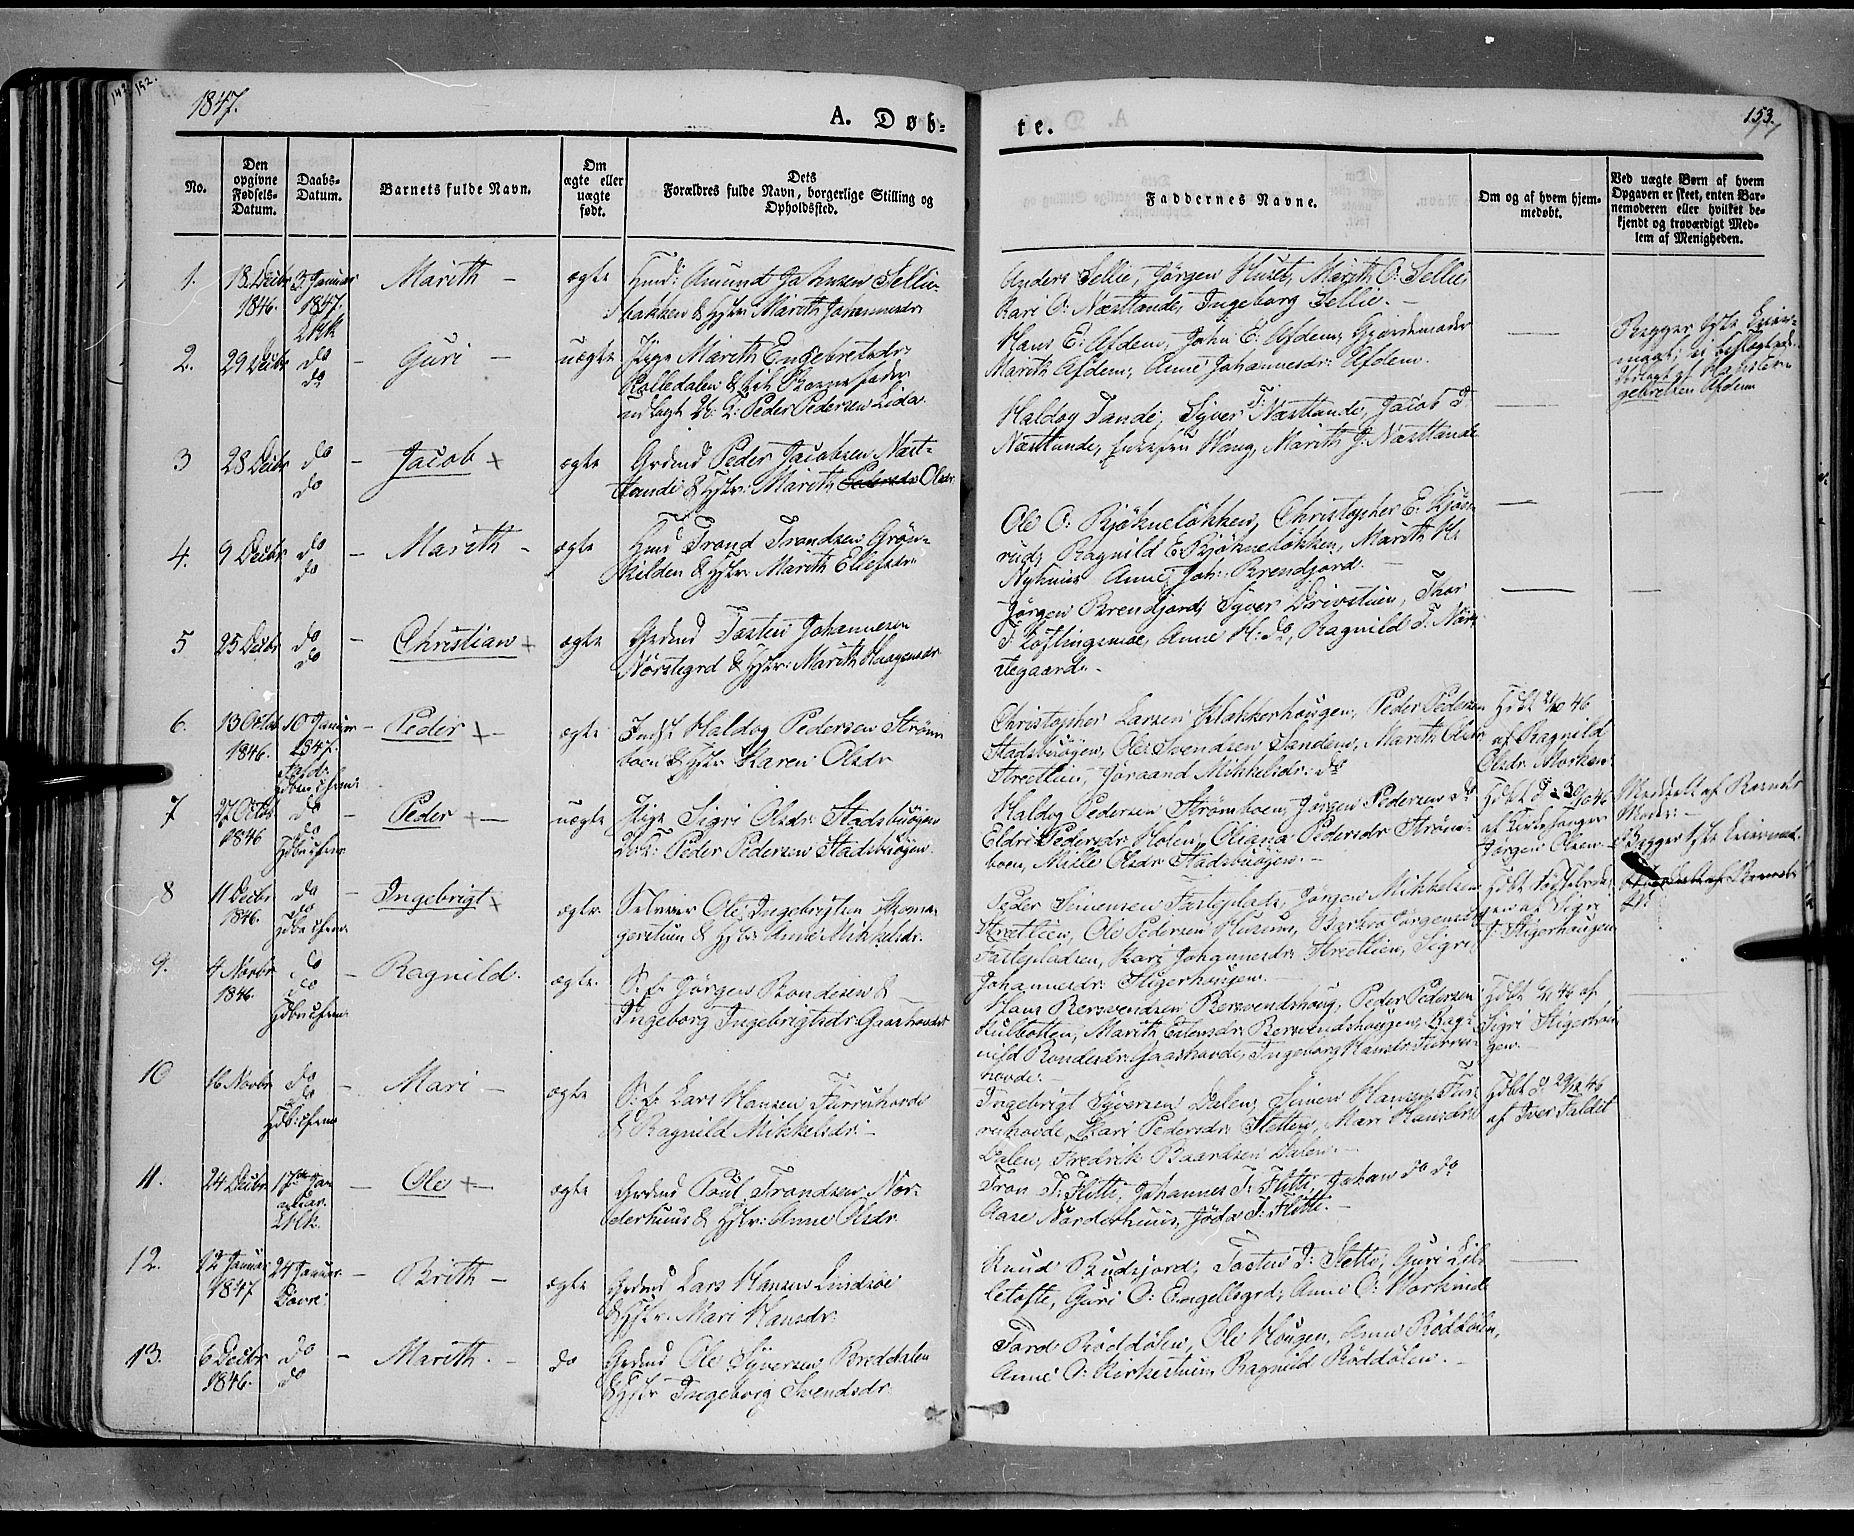 SAH, Lesja prestekontor, Ministerialbok nr. 6A, 1843-1854, s. 152-153